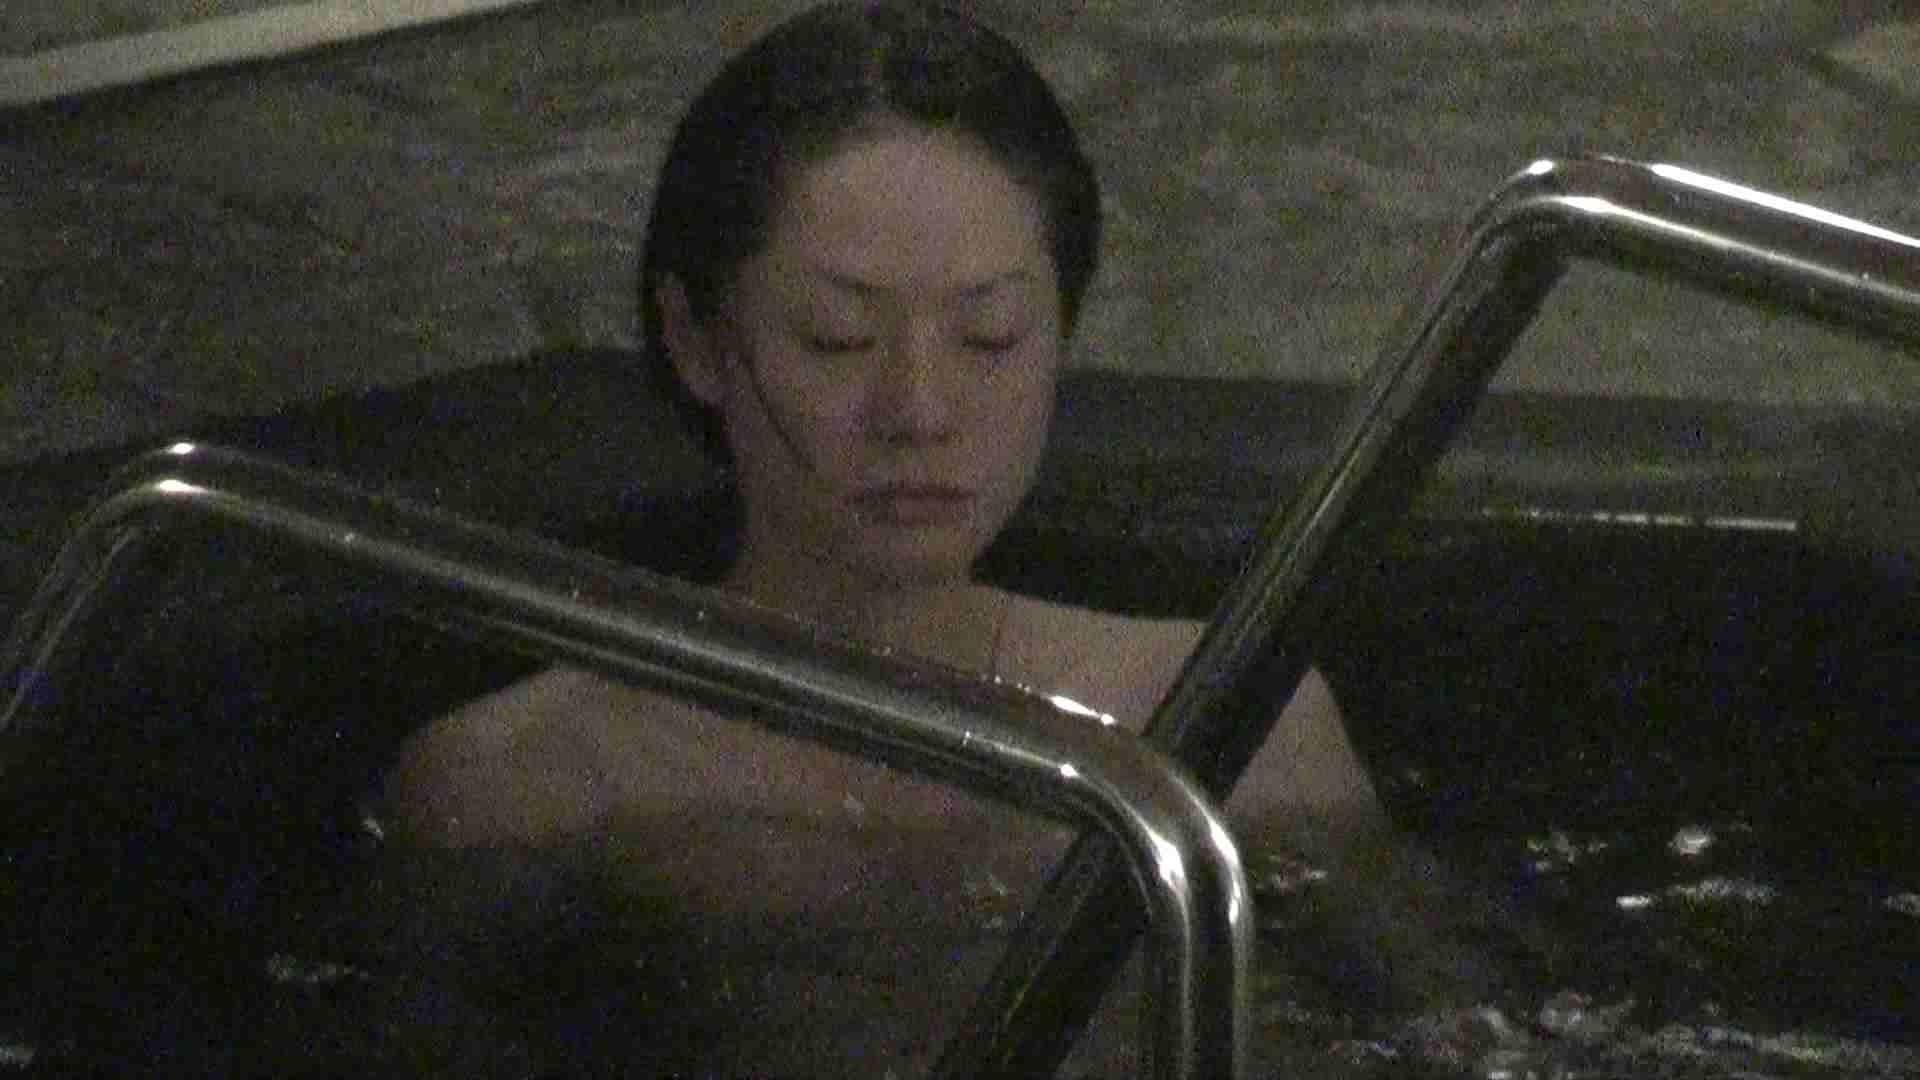 Aquaな露天風呂Vol.318 露天風呂編  109PIX 100